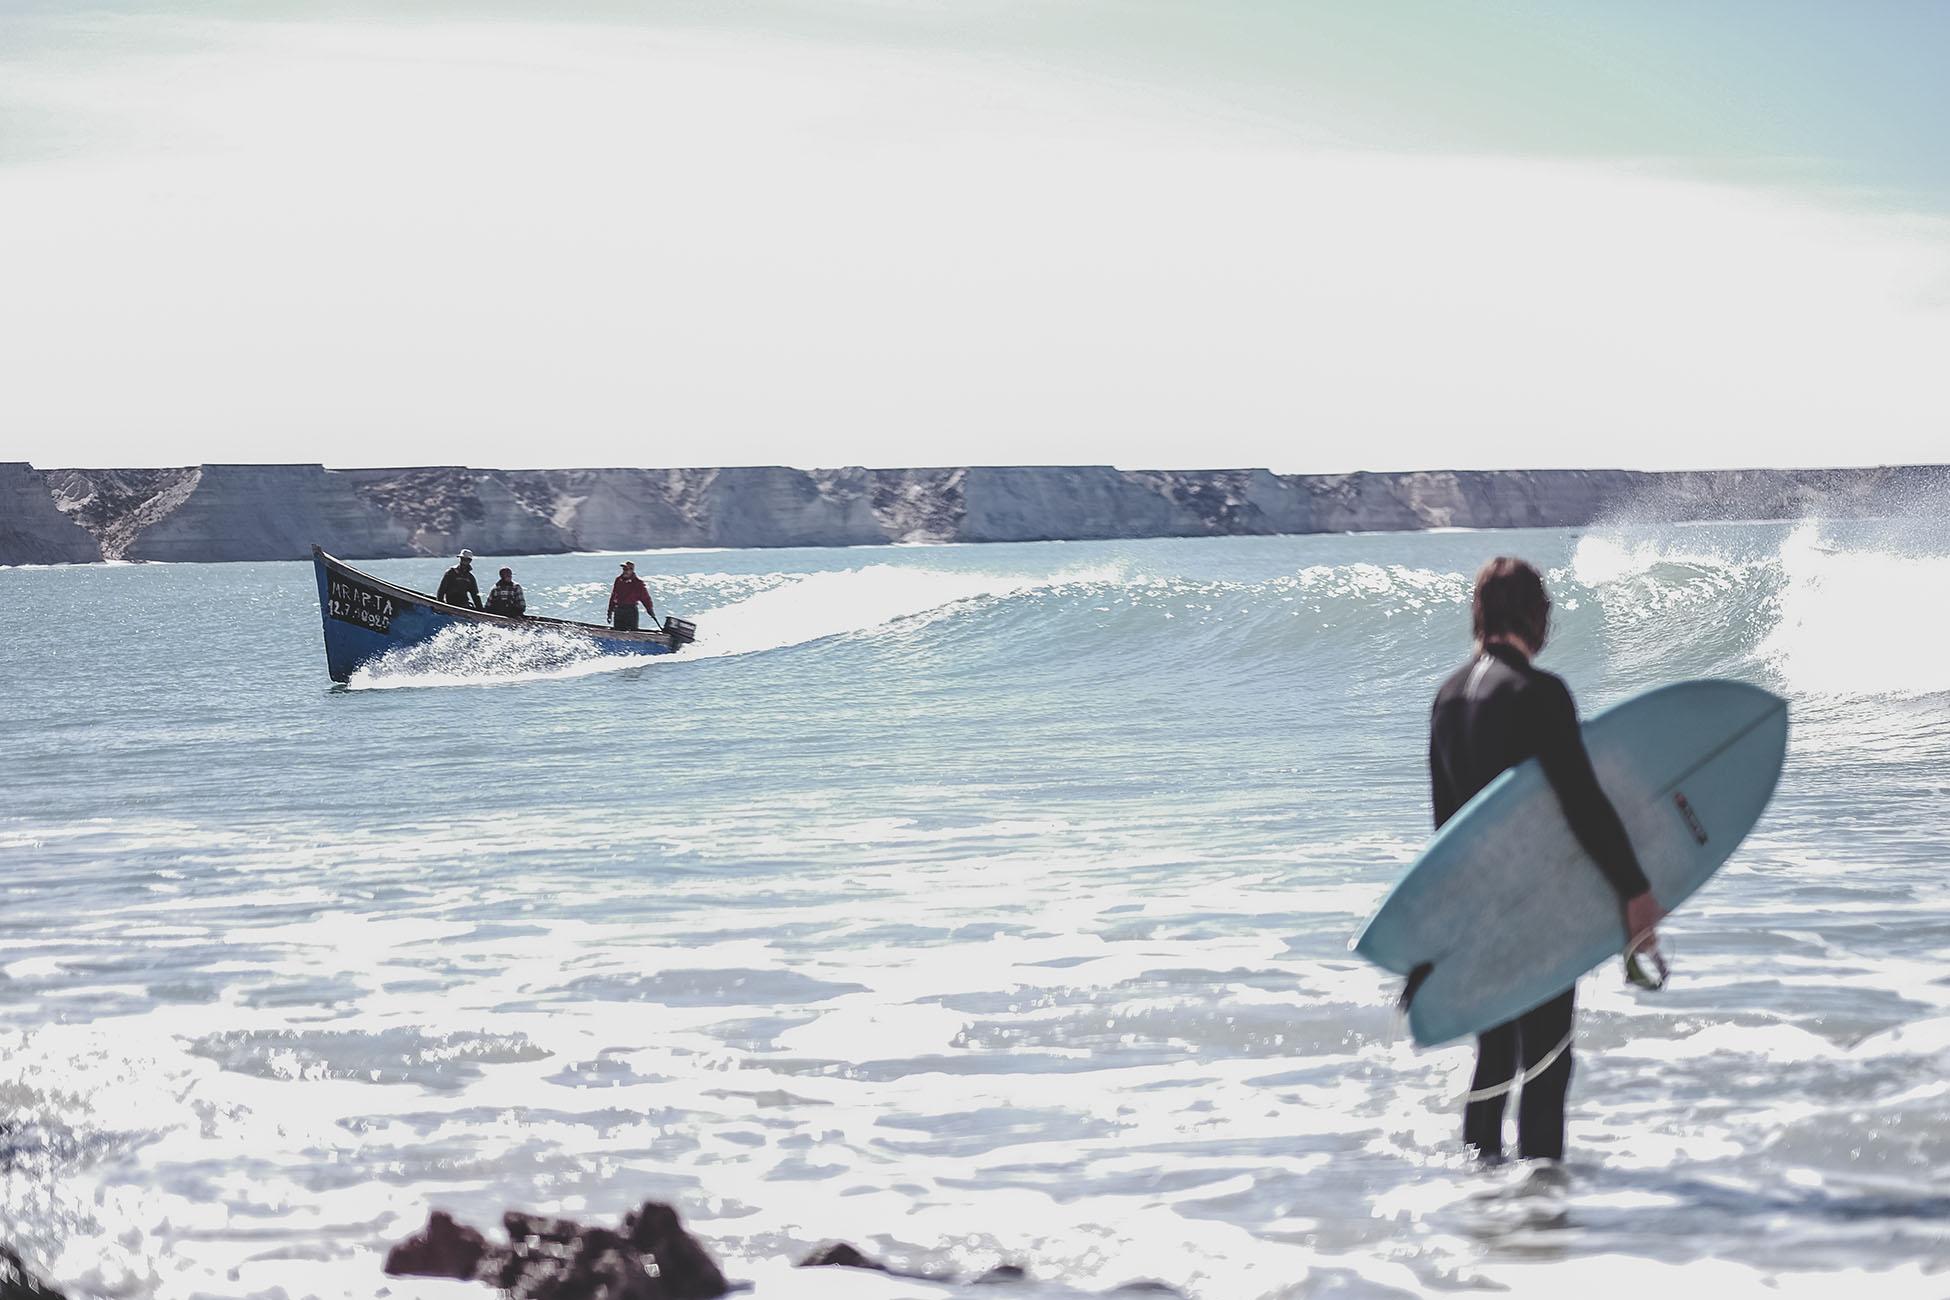 Surf Holidays Essaouira Morocco Surf School Lessons Lovingsurf